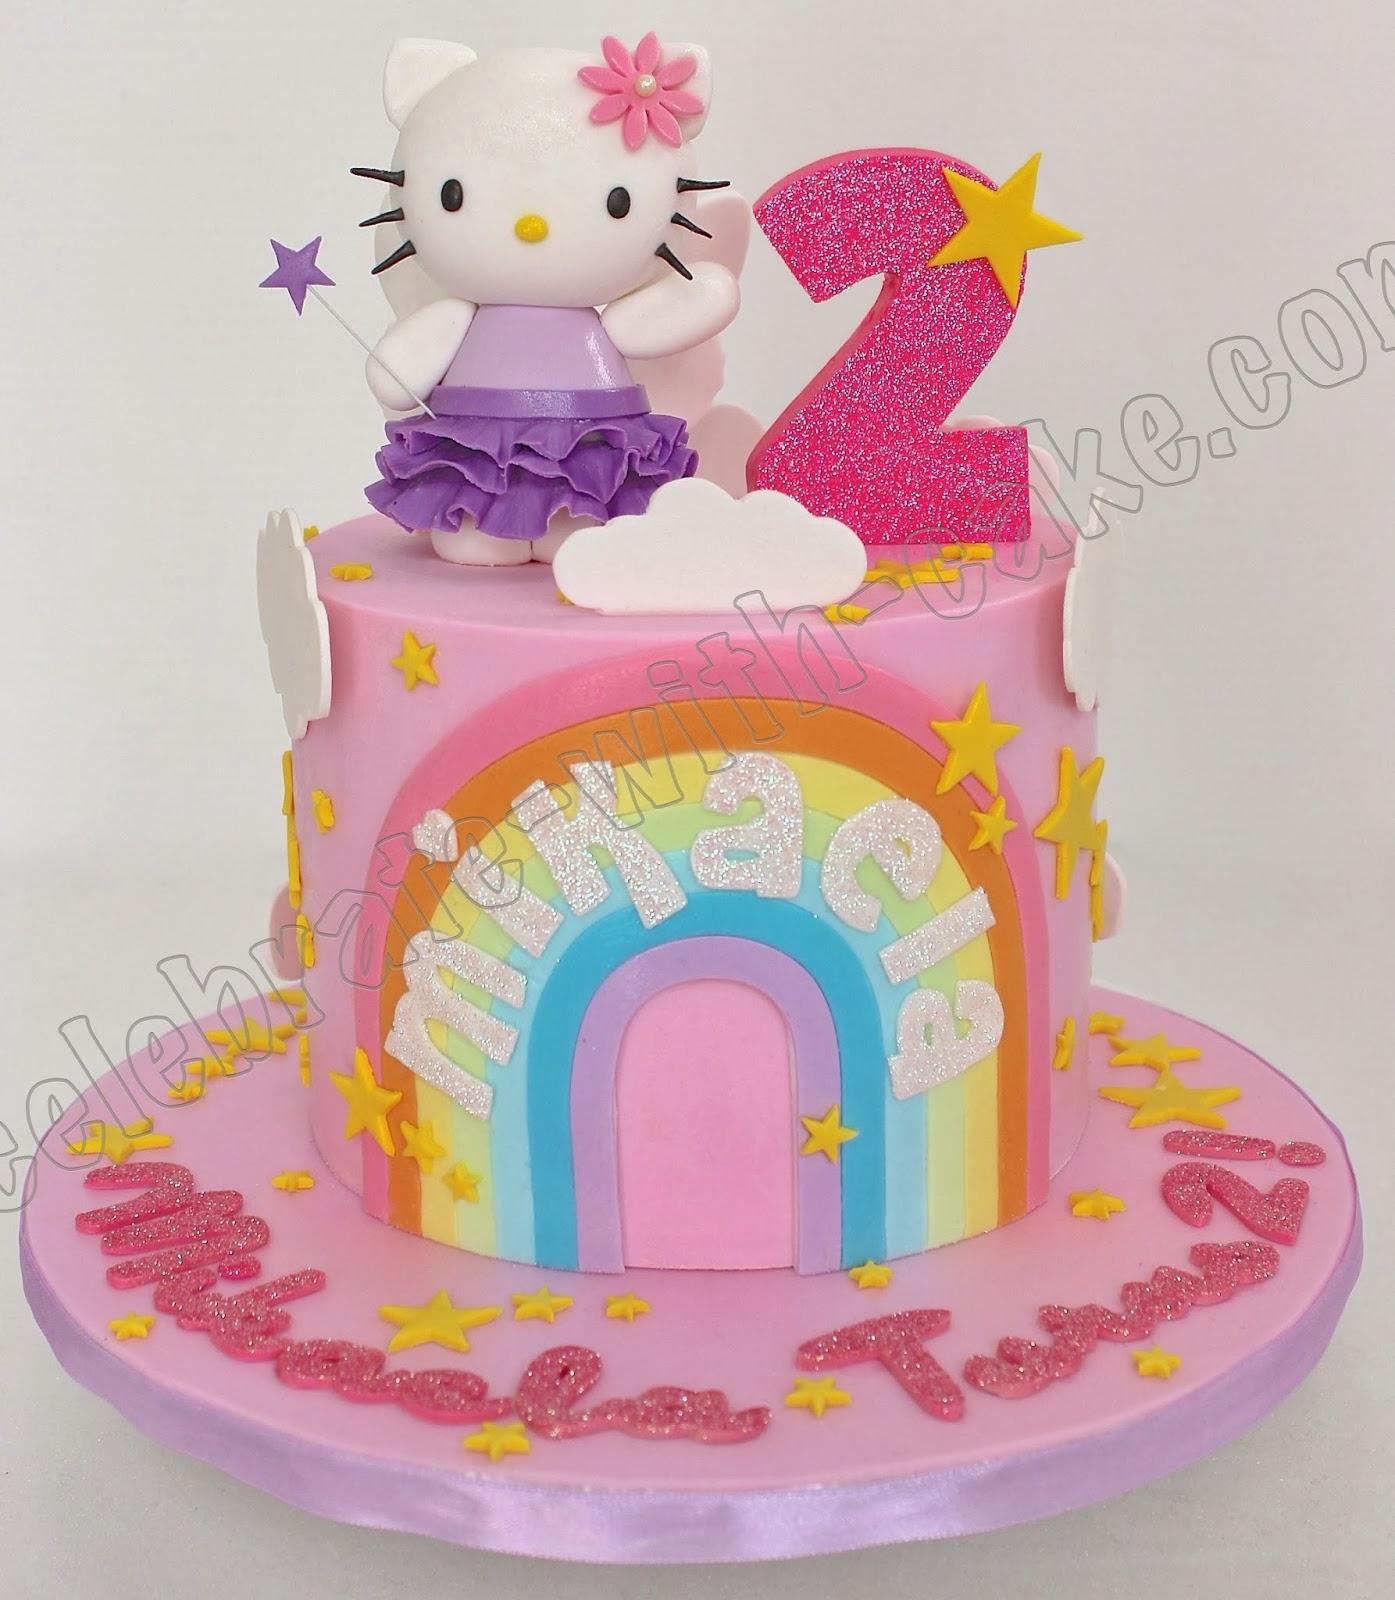 Celebrate with Cake Hello Kitty Pastel Rainbow